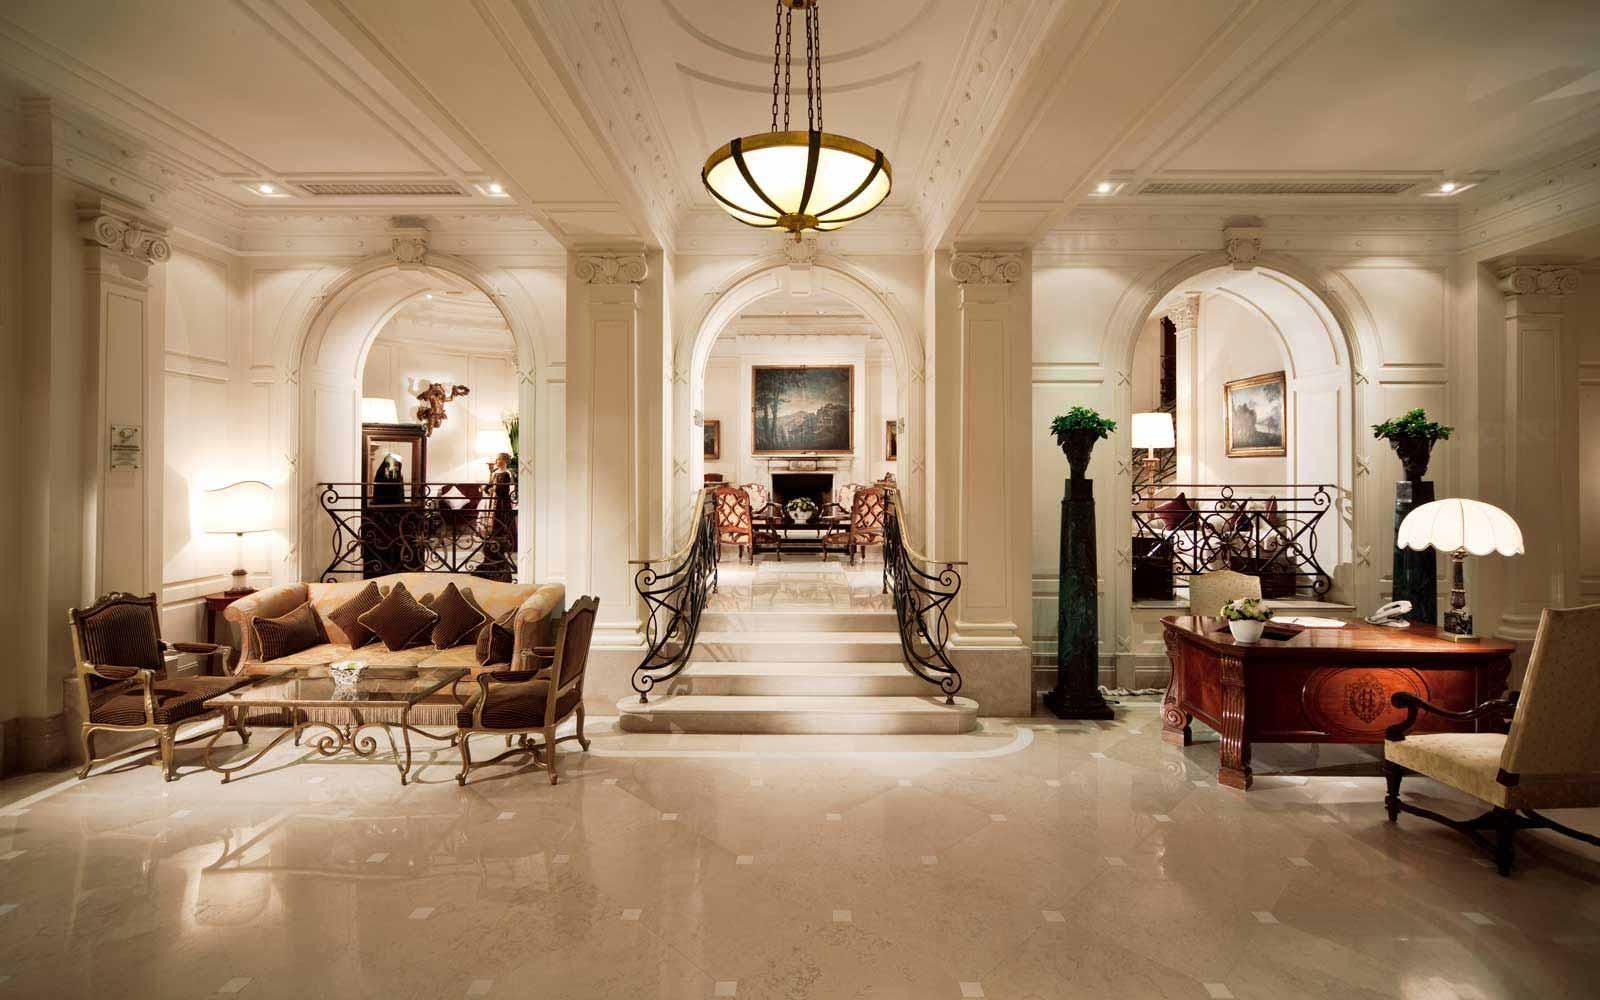 Reception hall at Hotel Eden